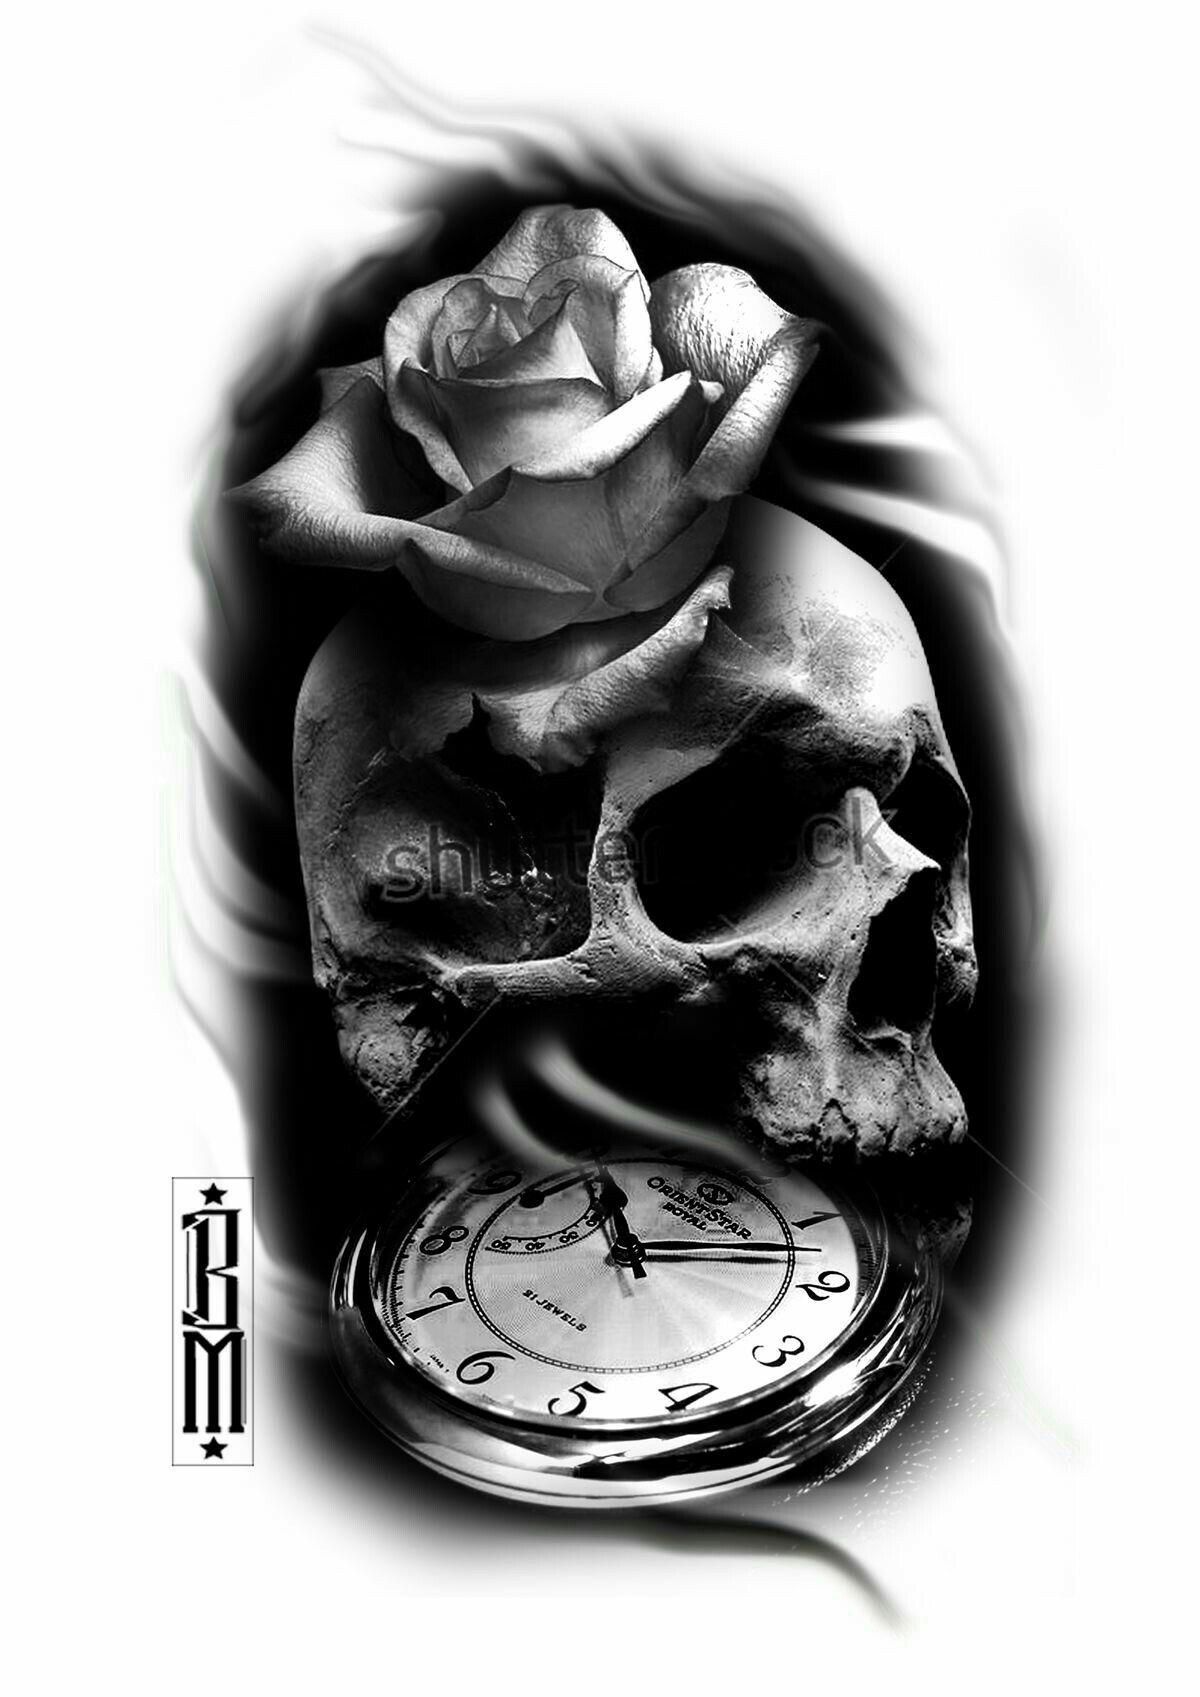 Skulltattoo Black And Grey Tattoos Sleeve Black And Grey Tattoos Grey Tattoo